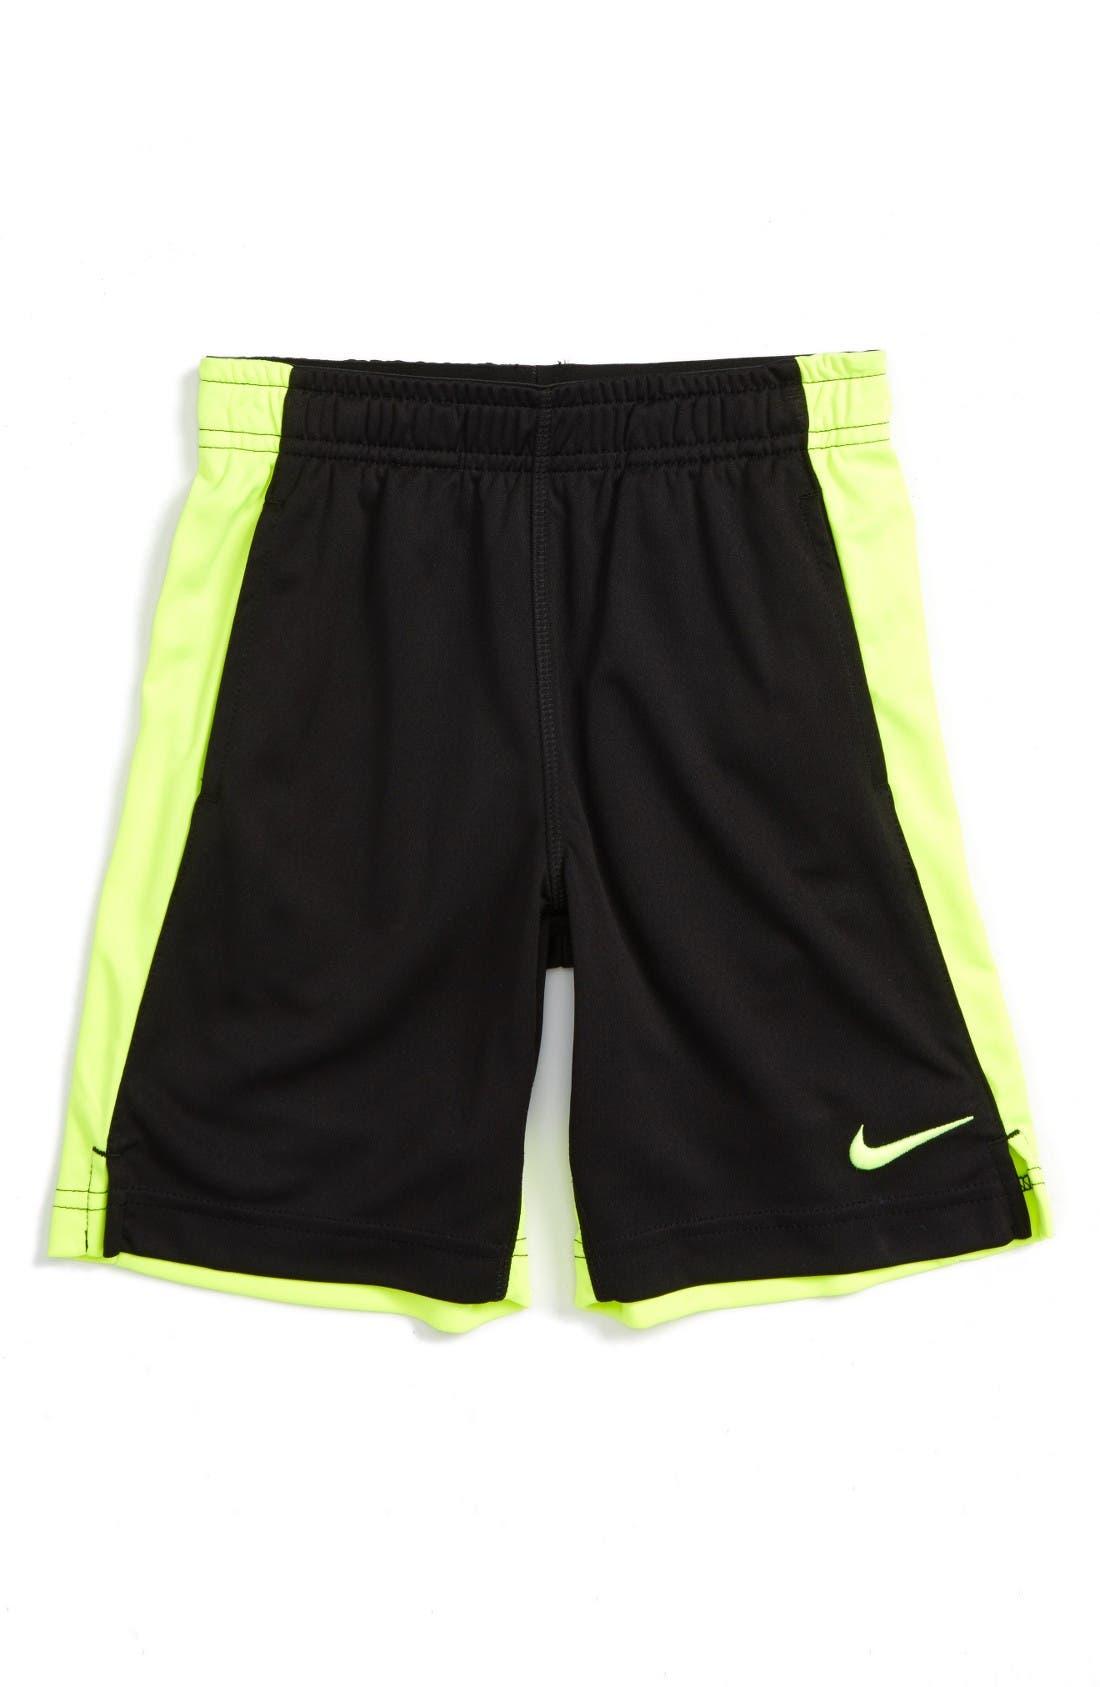 Main Image - Nike Dri-FIT Shorts (Toddler Boys & Little Boys)